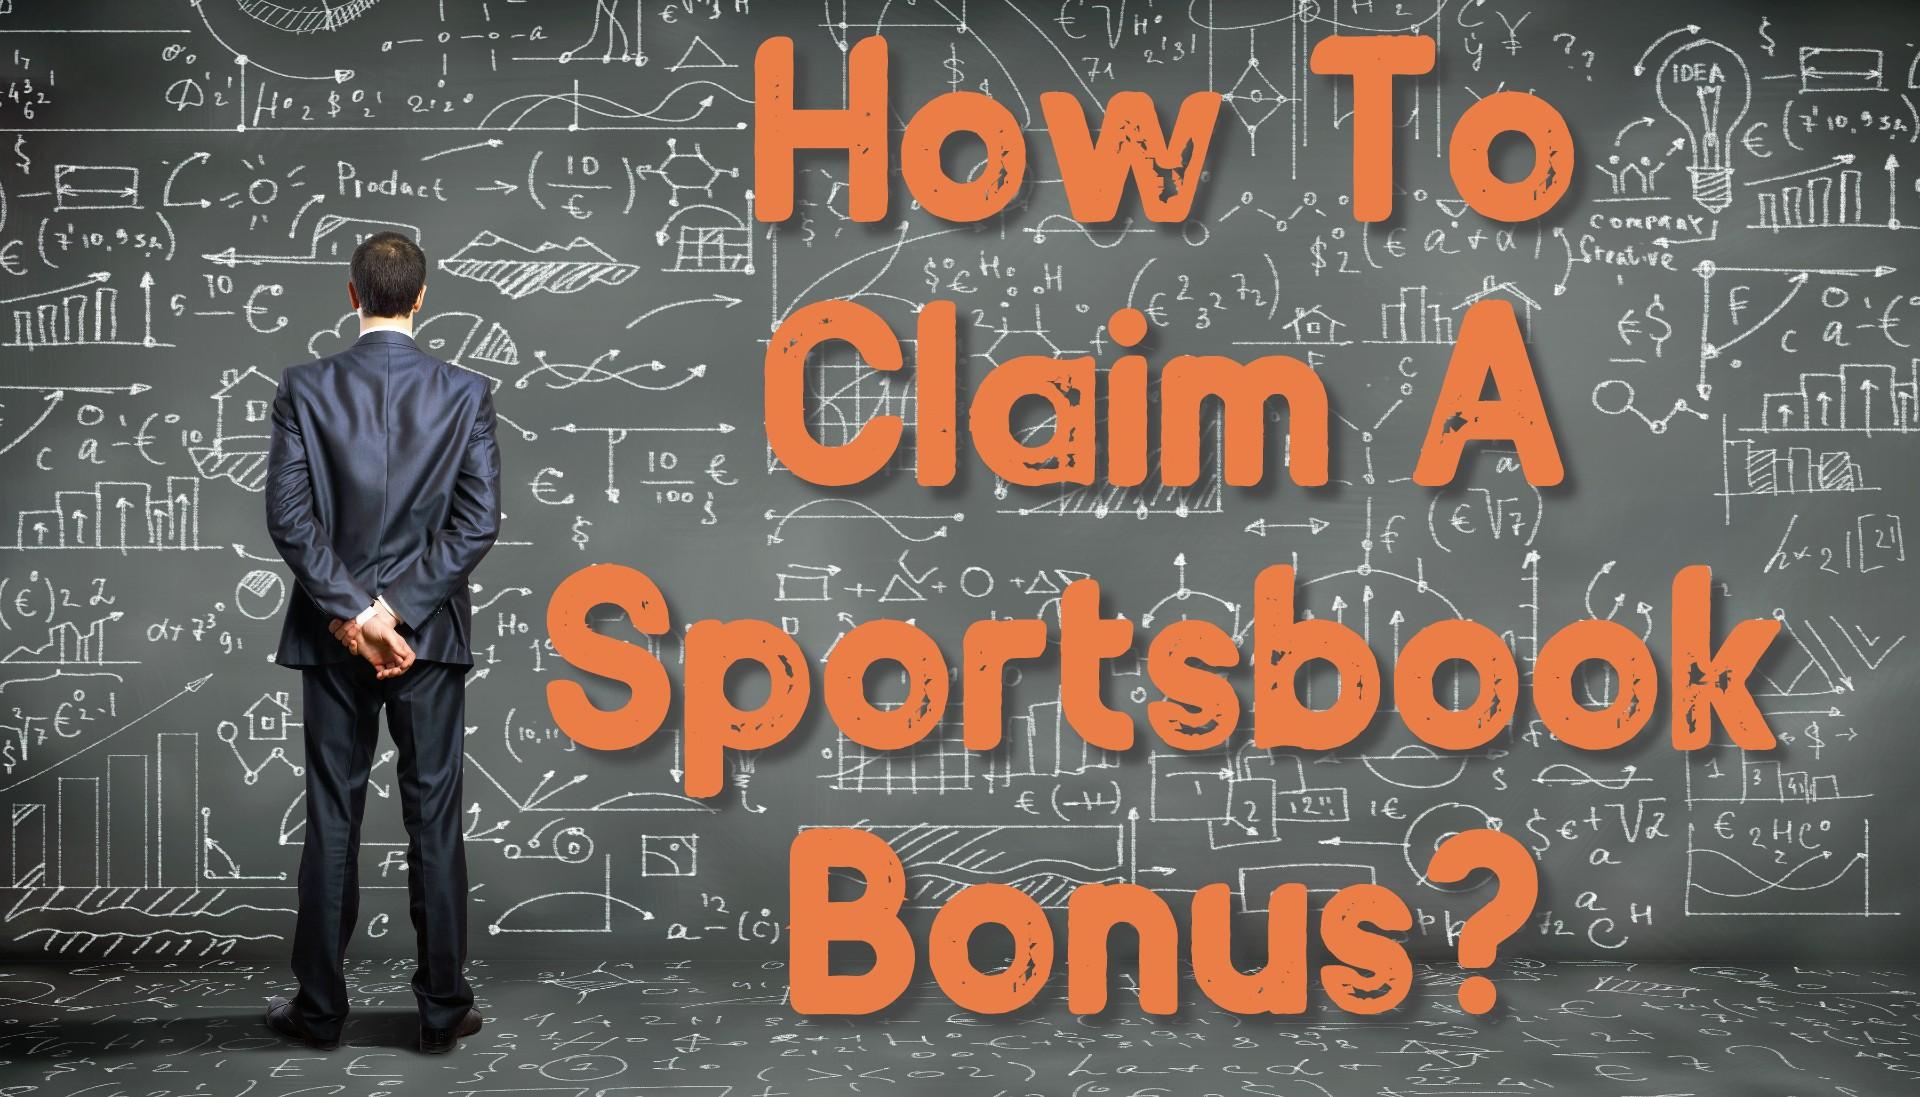 How To Claim A Sportsbook Bonus?